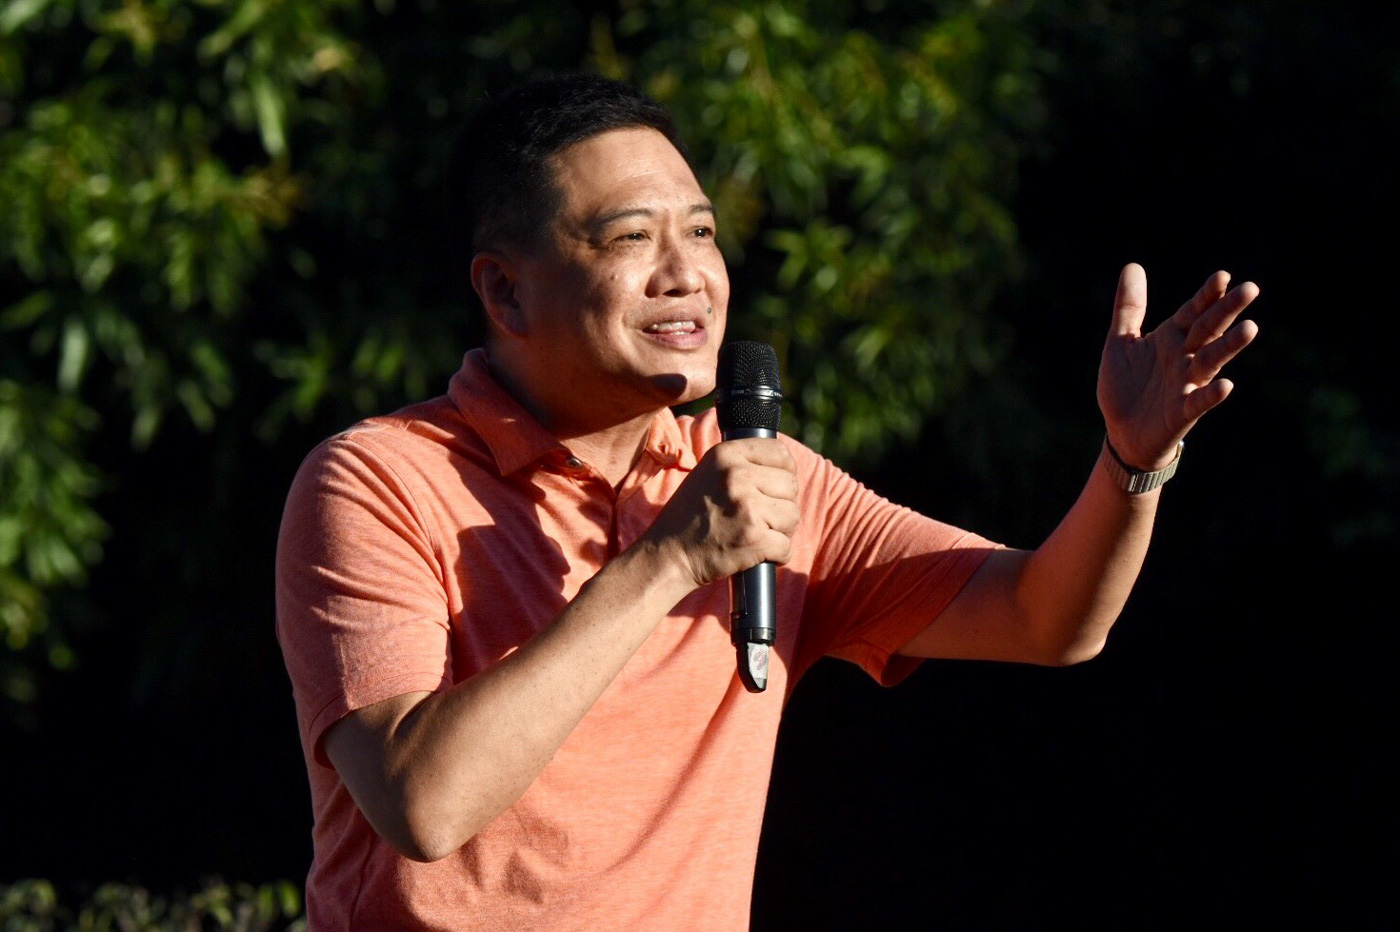 Former Quezon province representative Lorenzo 'Erin' Tau00f1ada III speaks at the rally. Photo by Angie de Silva/Rappler